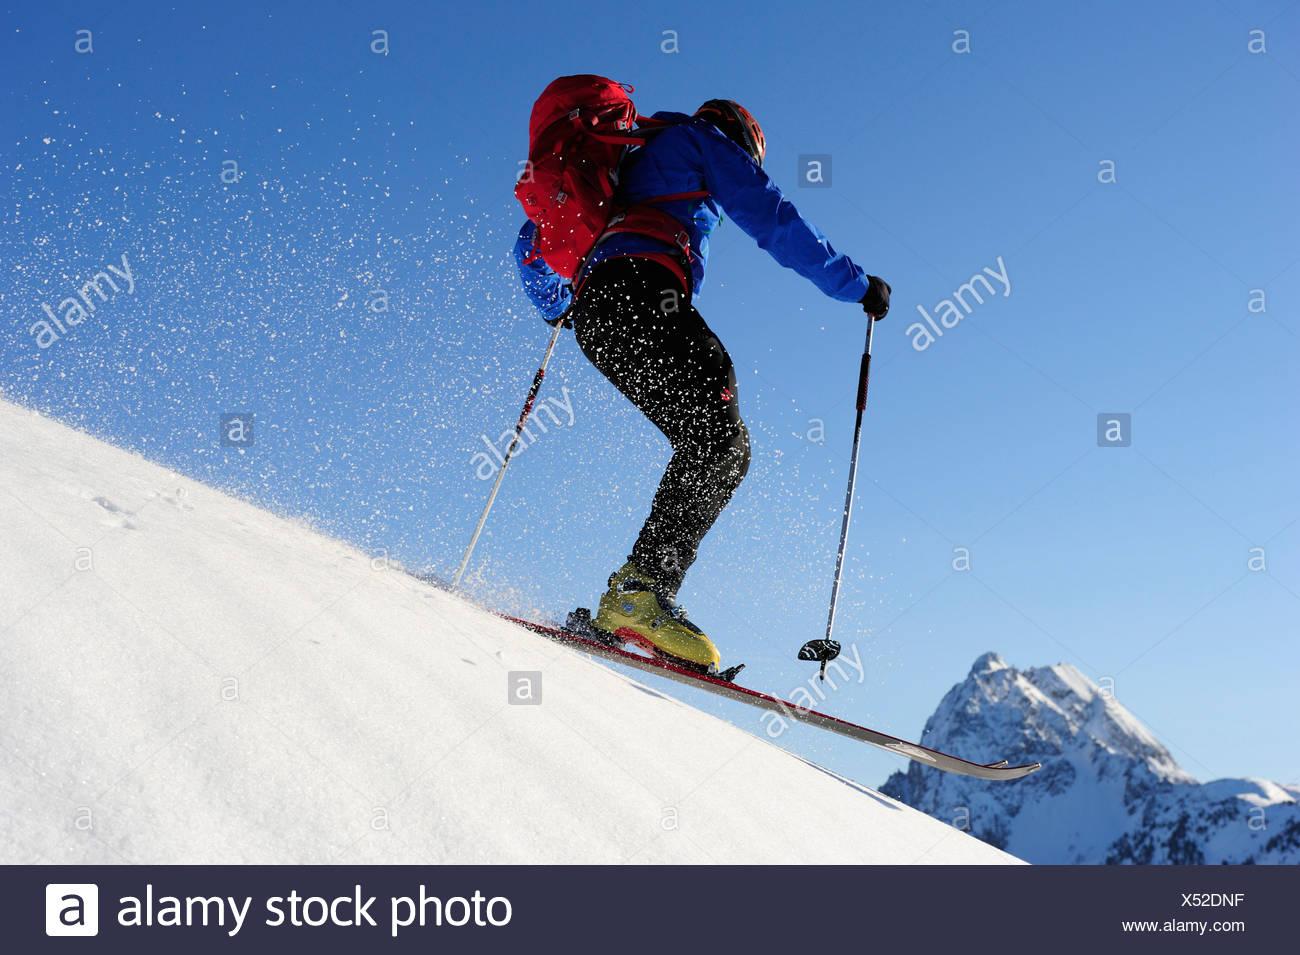 Backcountry skier downhill skiing from Brechhorn, Grosser Rettenstein in background, Kitzbuehel Alps, Tyrol, Austria - Stock Image